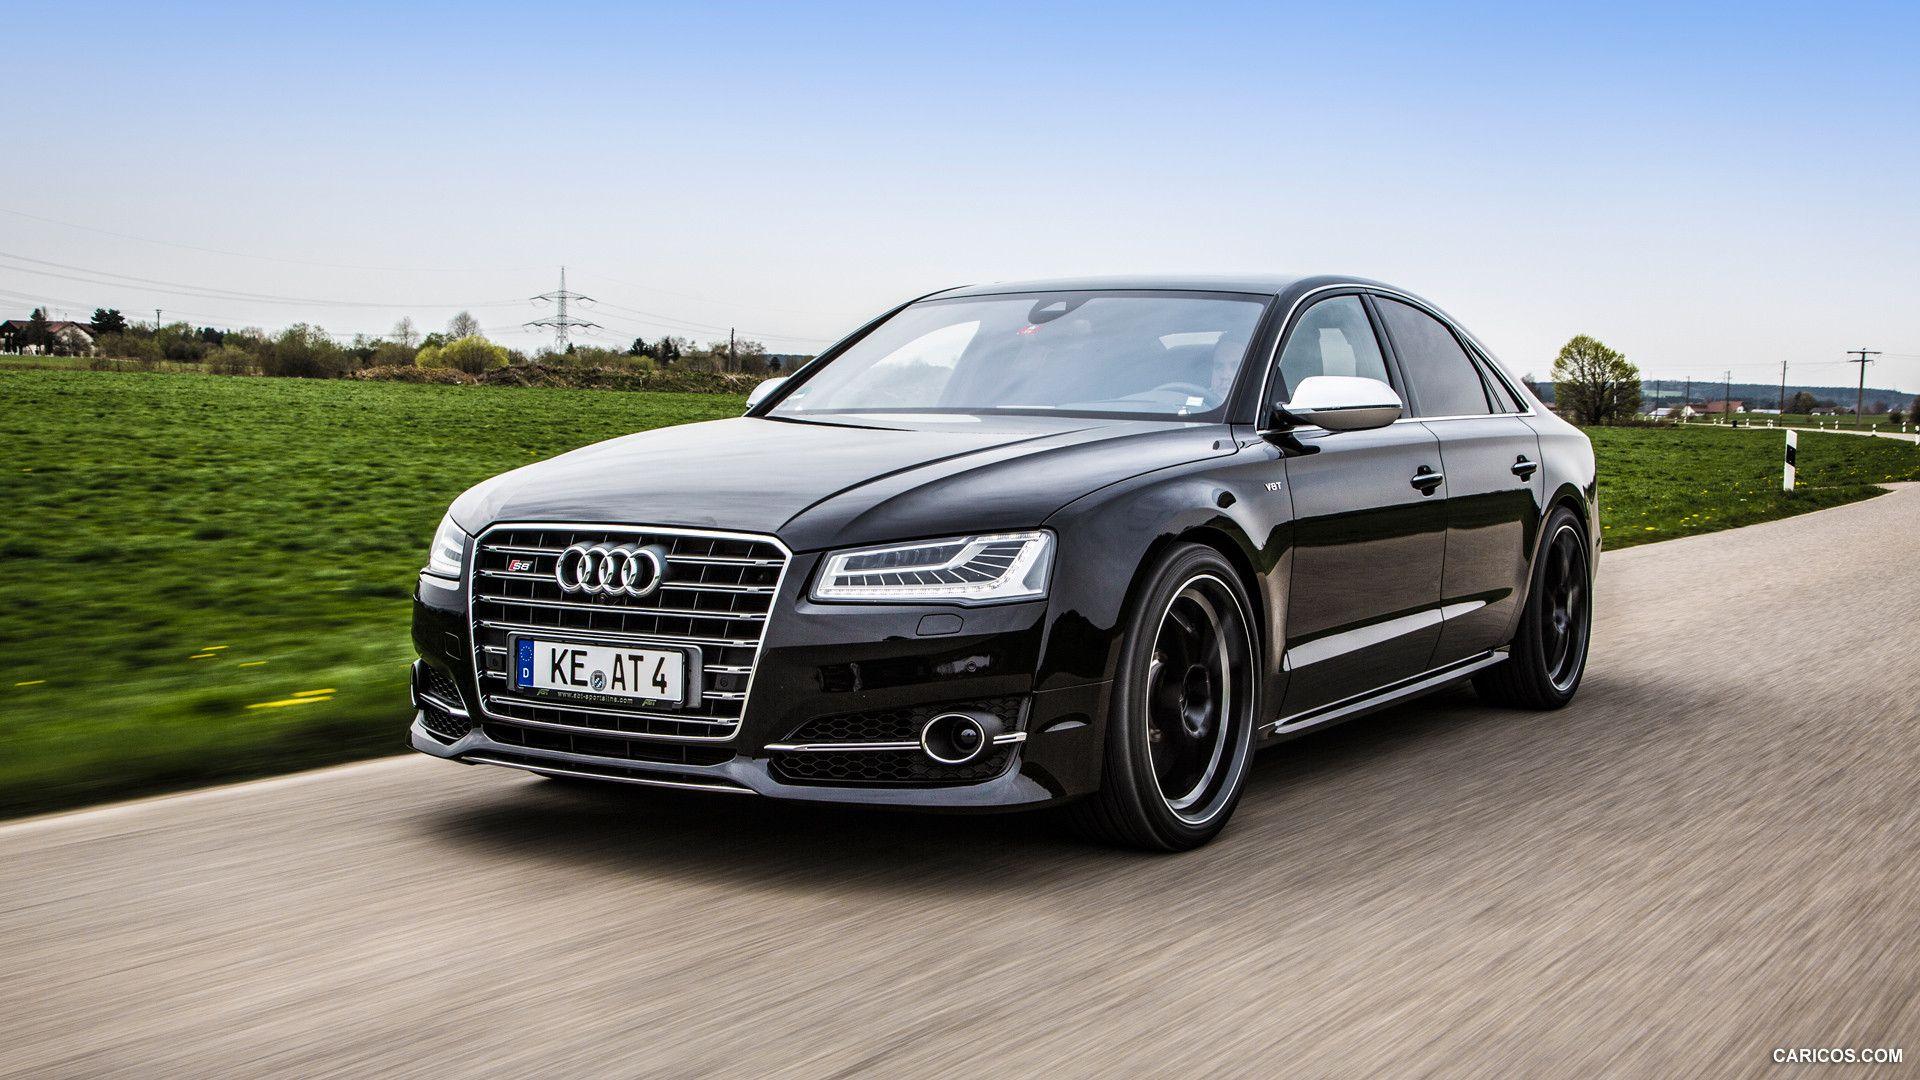 2015 Abt Audi S8 Power S Audi A8 Audi Audi Cars